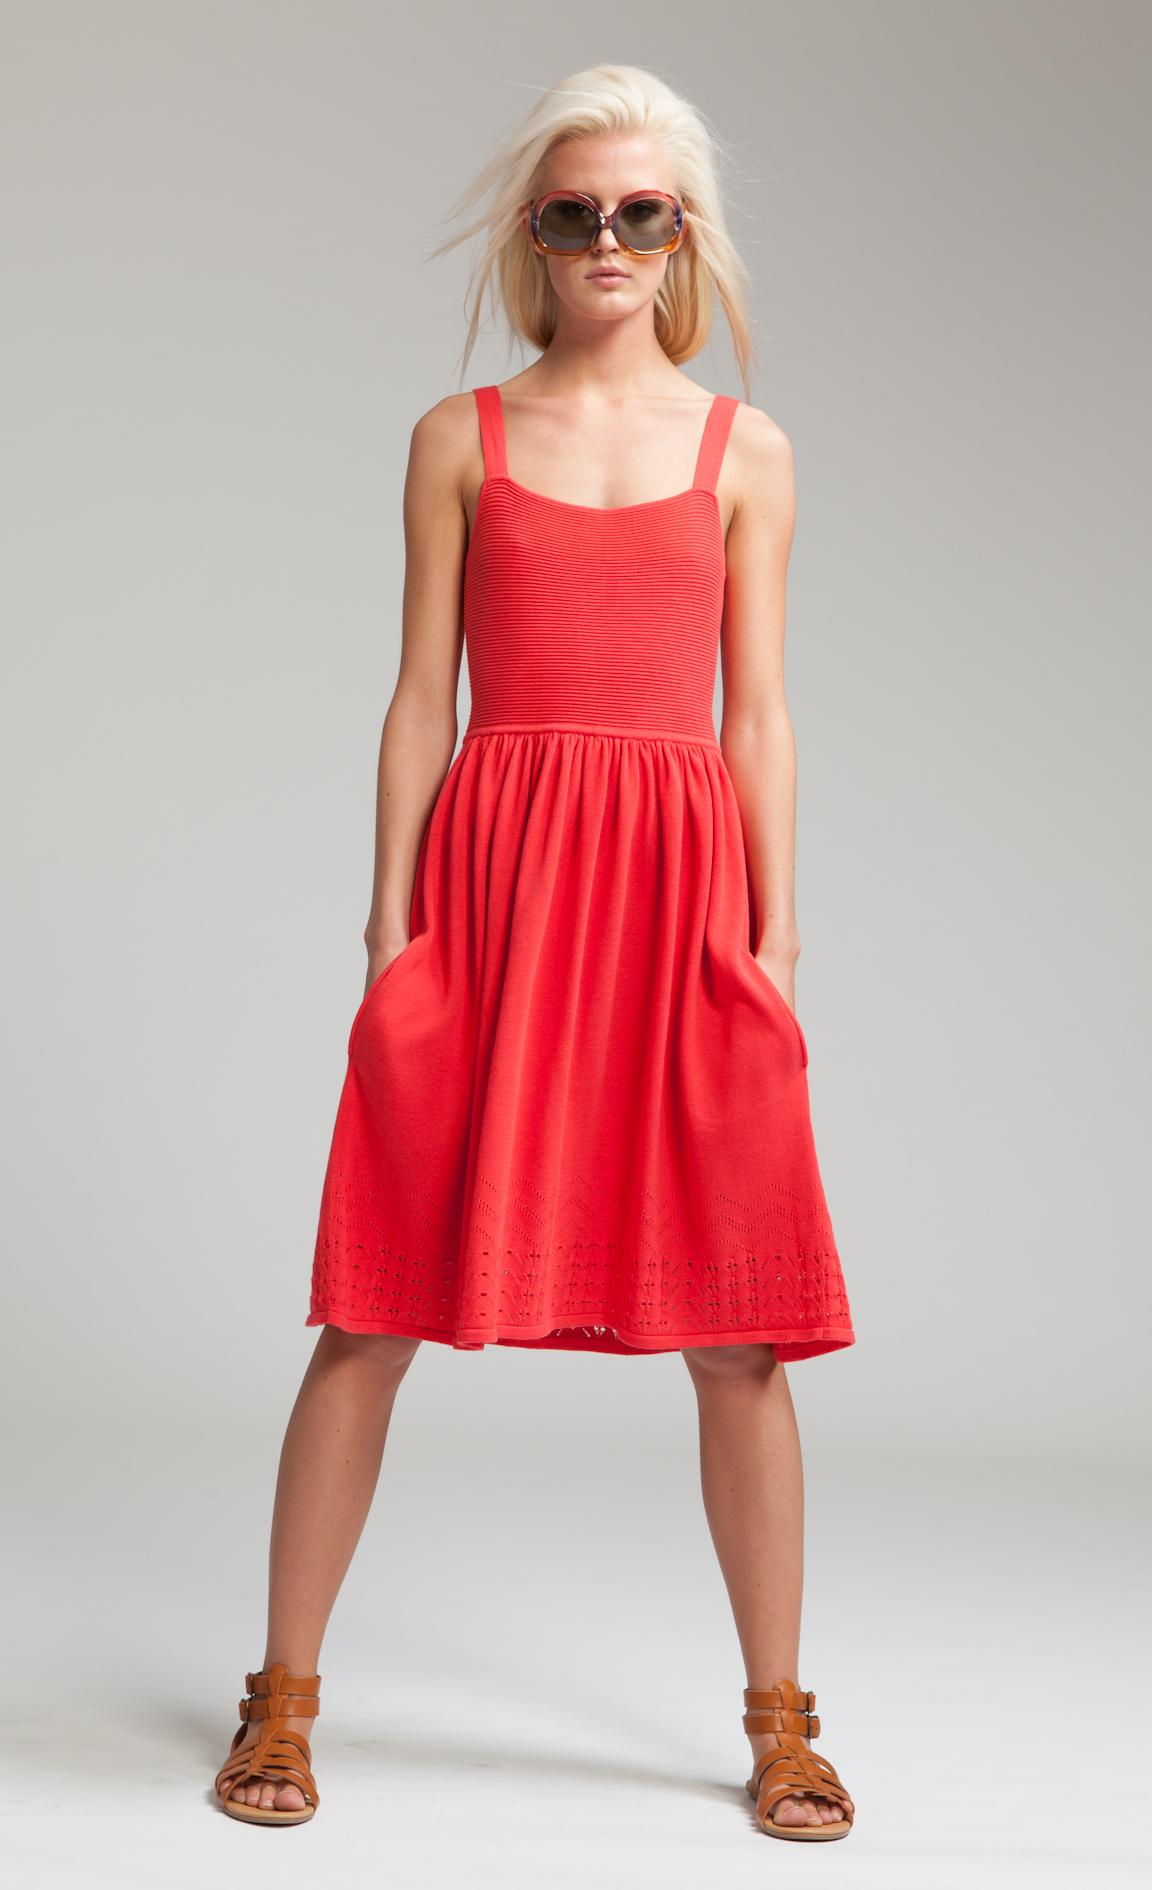 Temperley London Ray Strappy Dress In Poppy Red Lyst